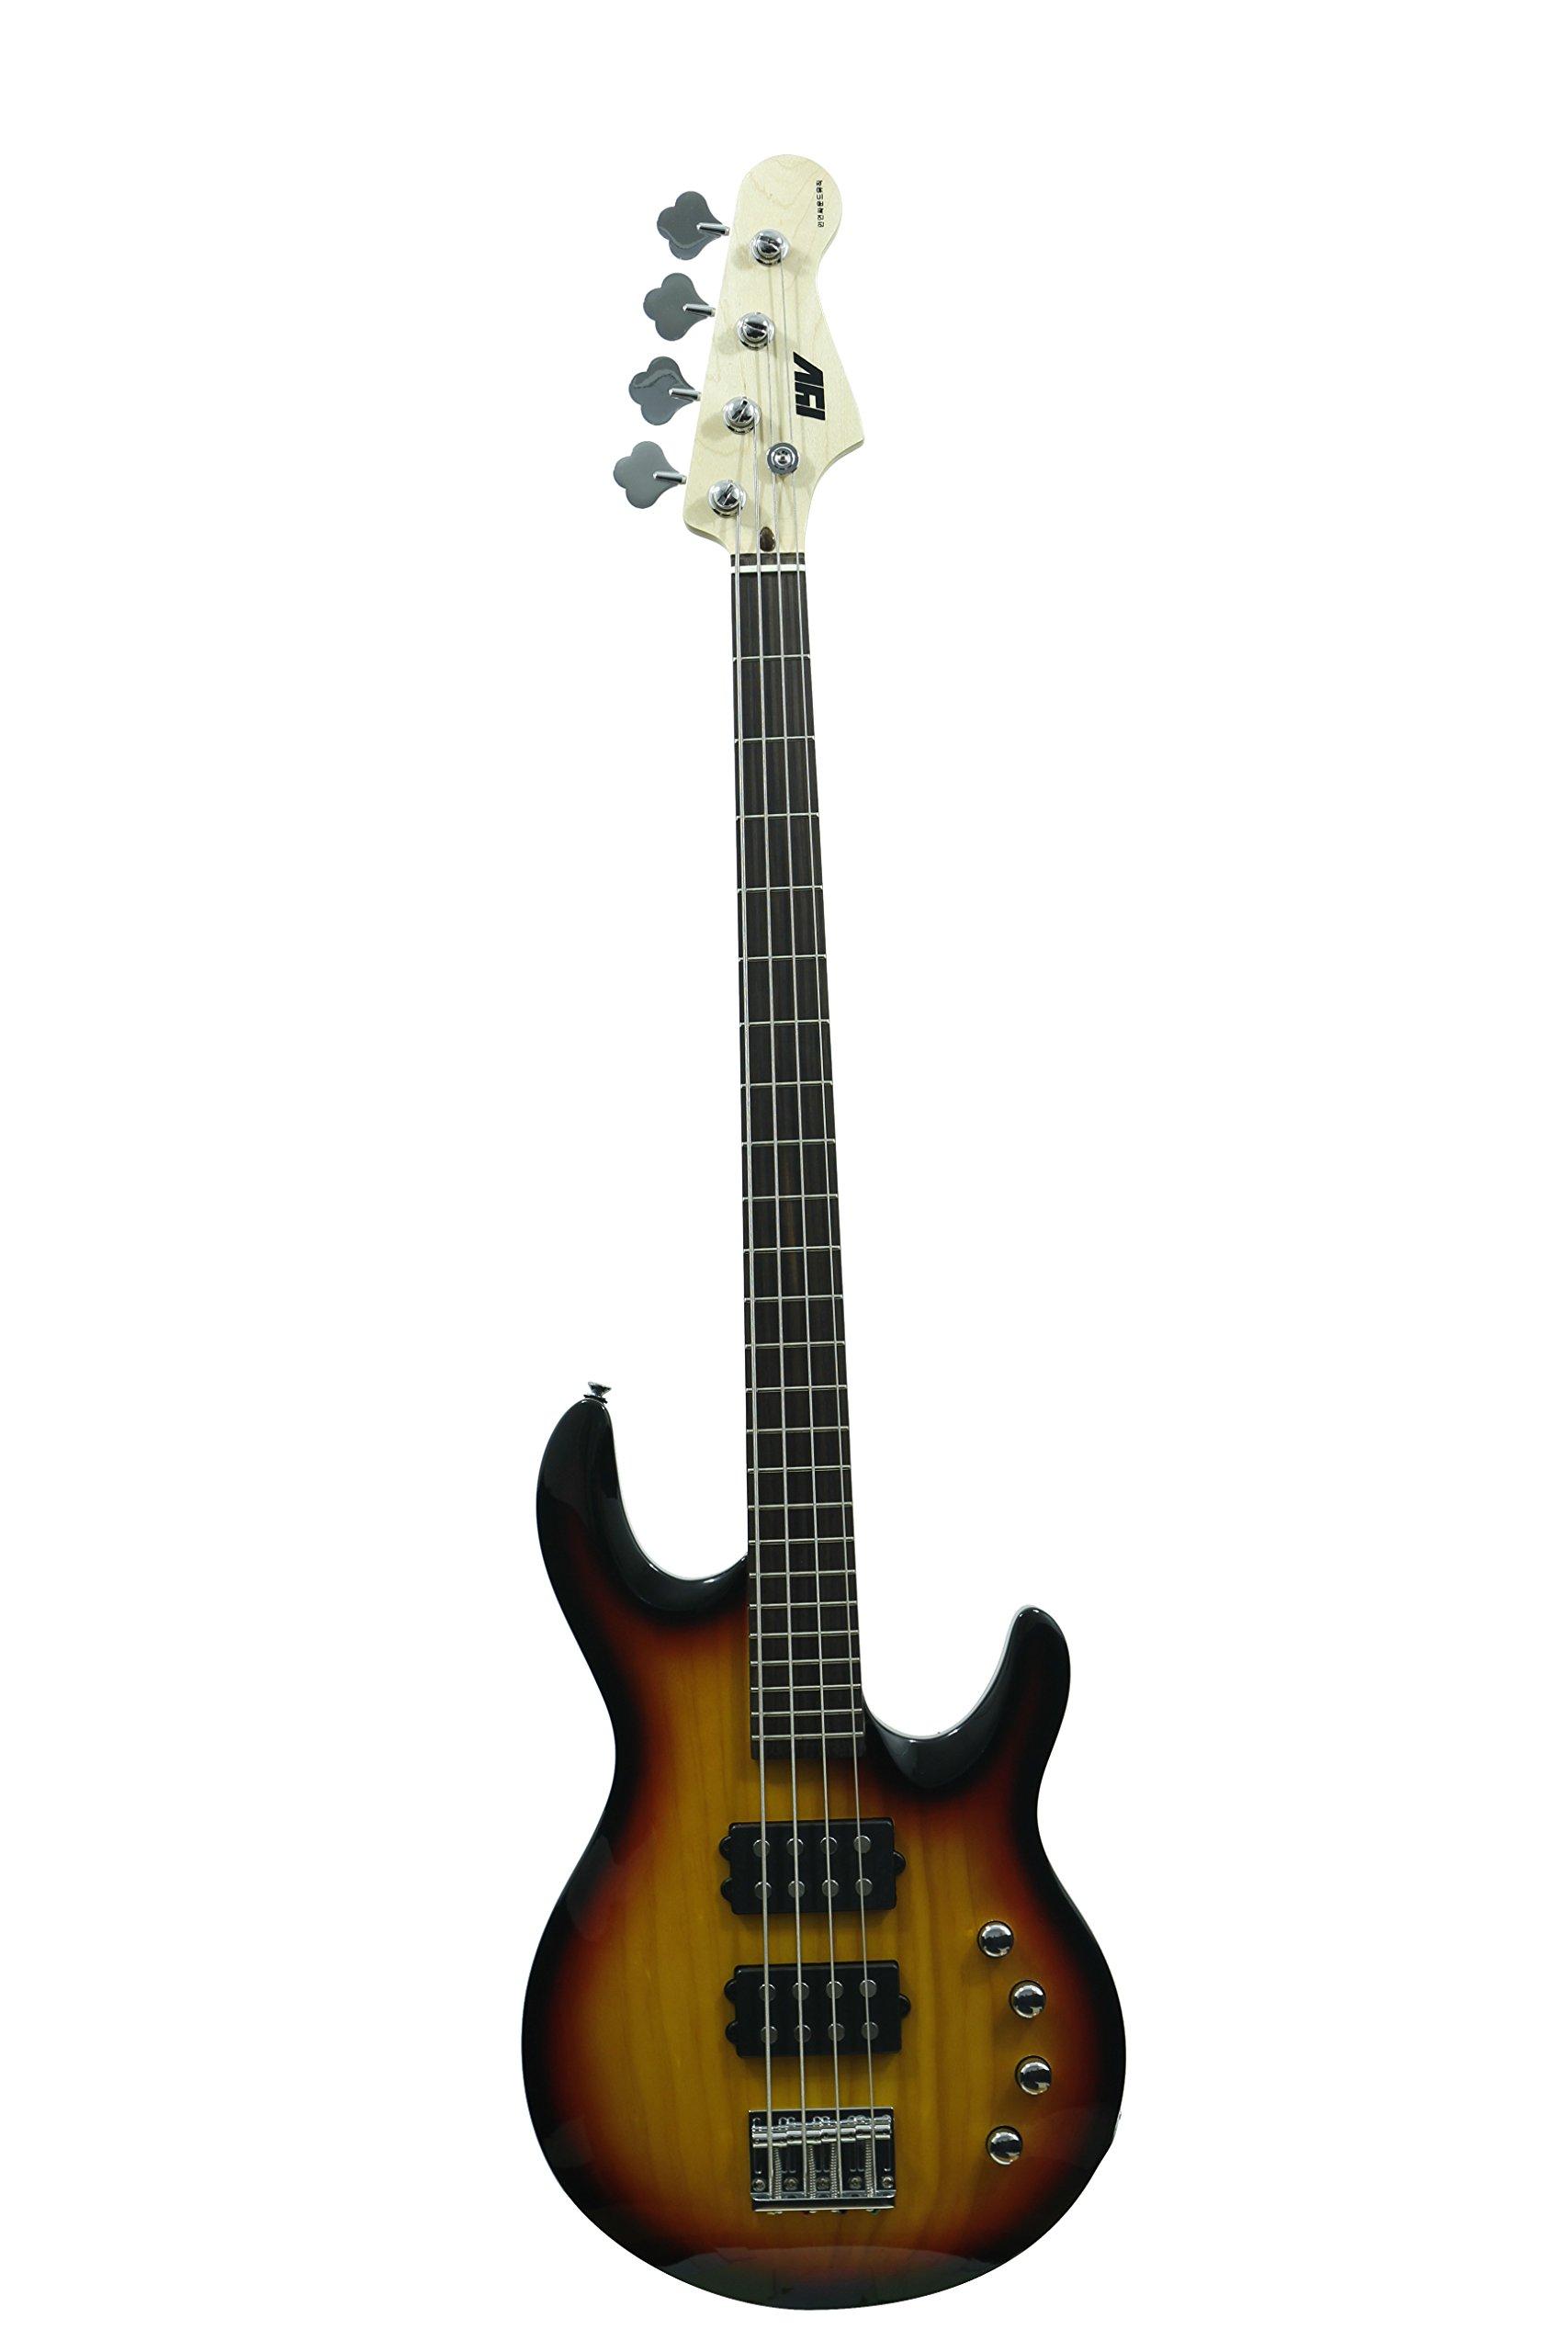 Cheap ivy IMM-300SB Bass Solid-Body Electric Guitar Sunburst Black Friday & Cyber Monday 2019